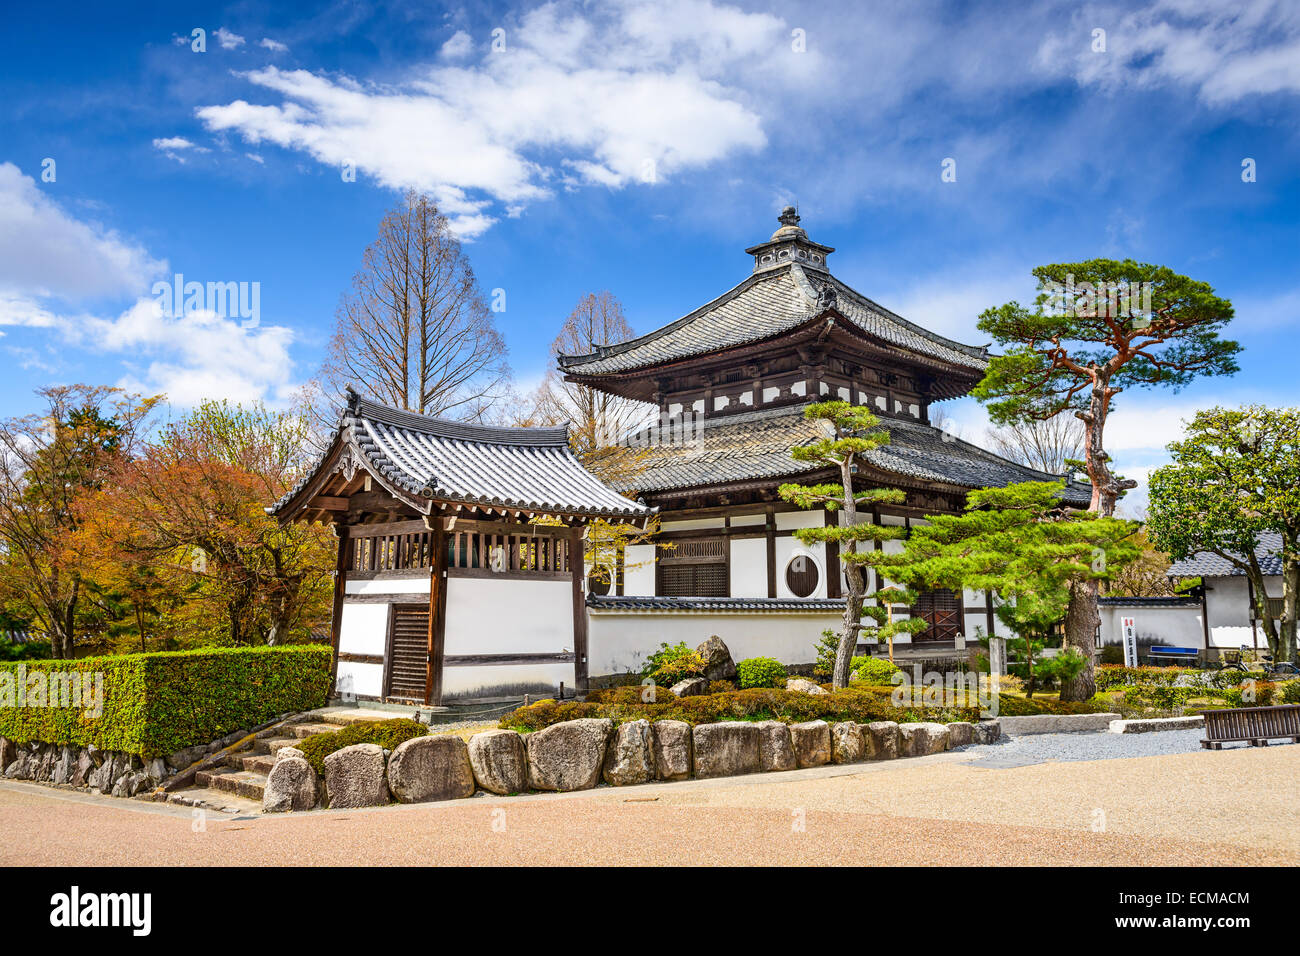 Kyoto, Japan buildings on the grounds of Tofuku-ji Temple. - Stock Image